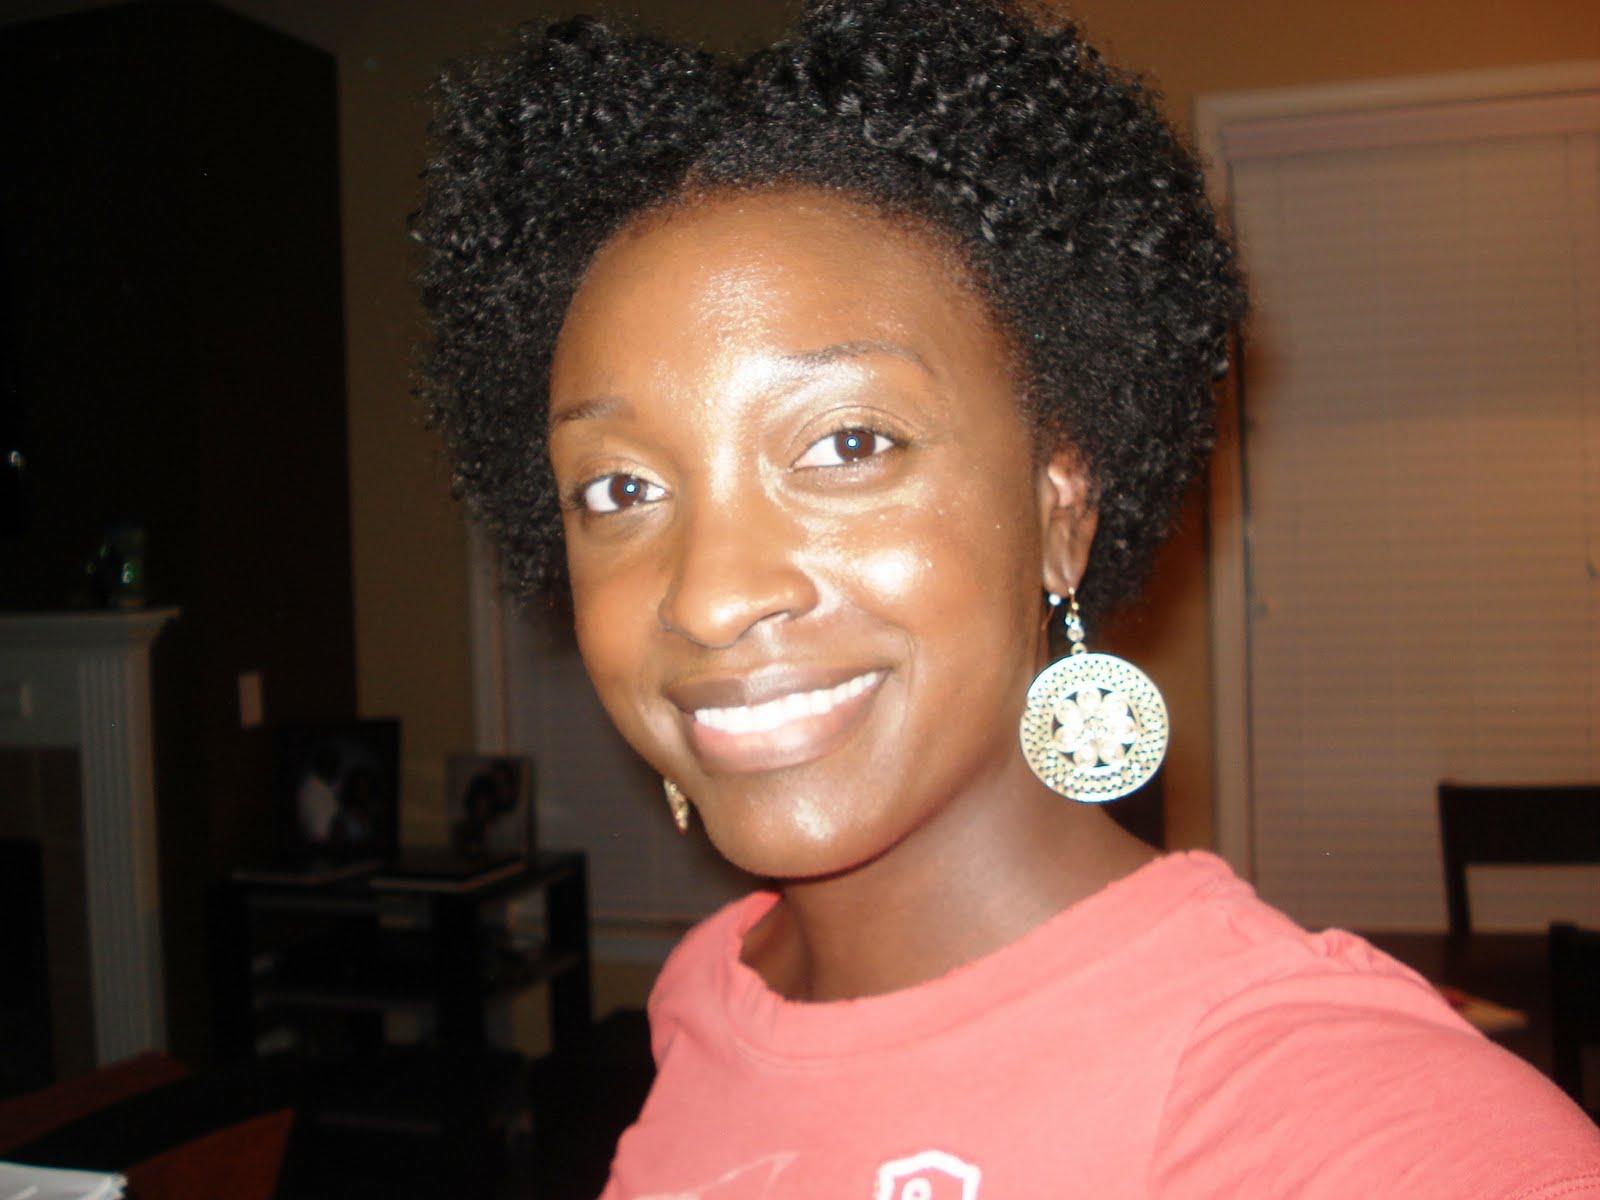 Strange 30 Impressive Short Natural Hairstyles For Black Women Creativefan Hairstyles For Men Maxibearus